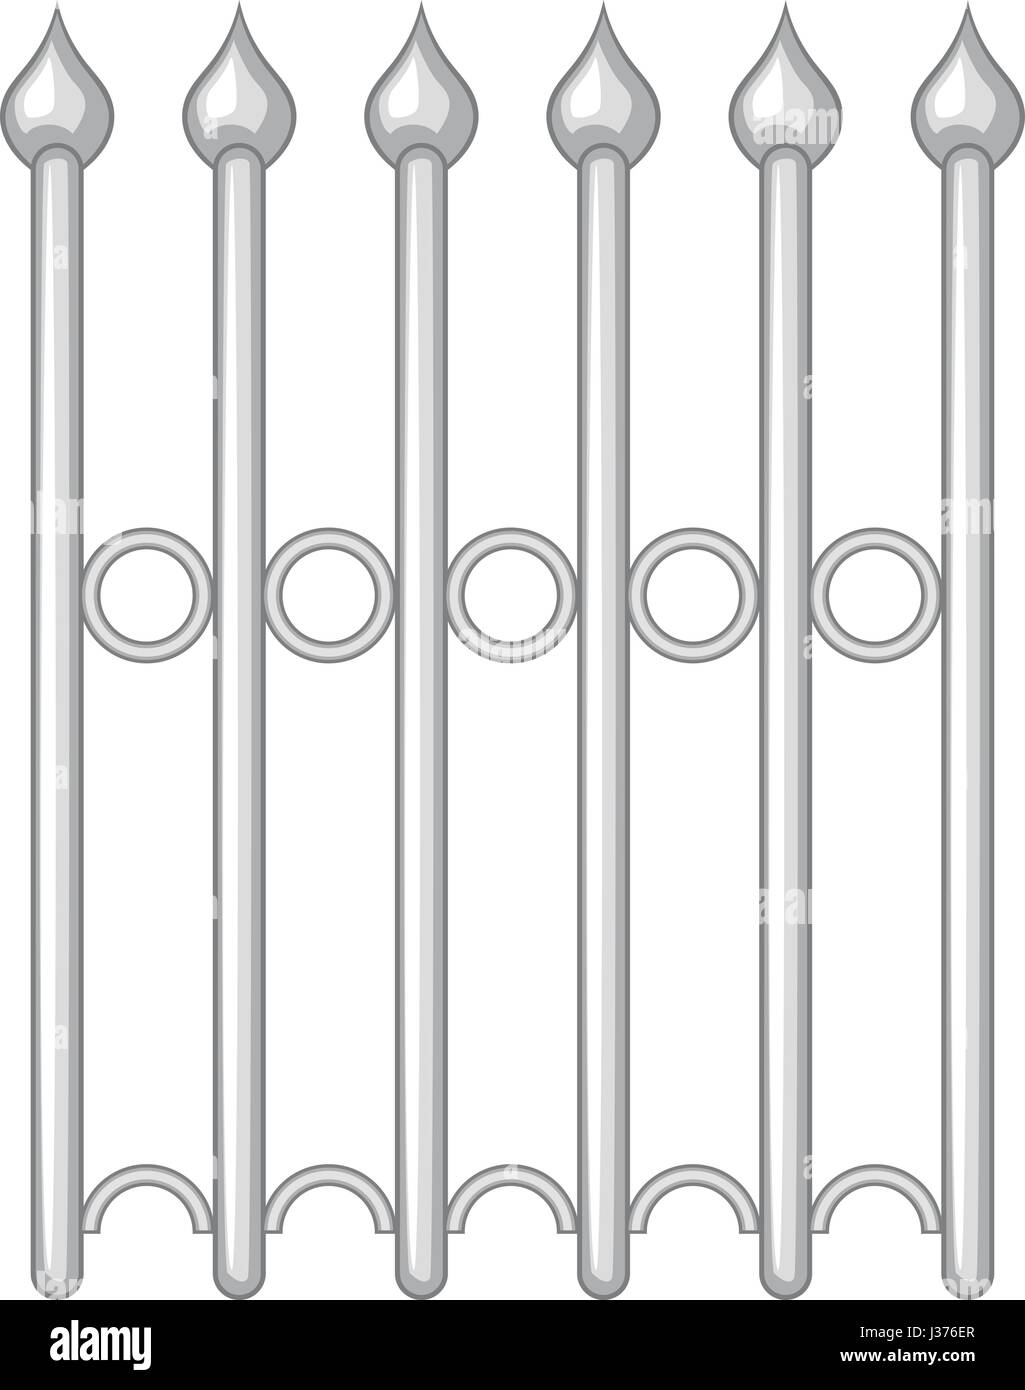 Decorative iron fence icon monochrome - Stock Image